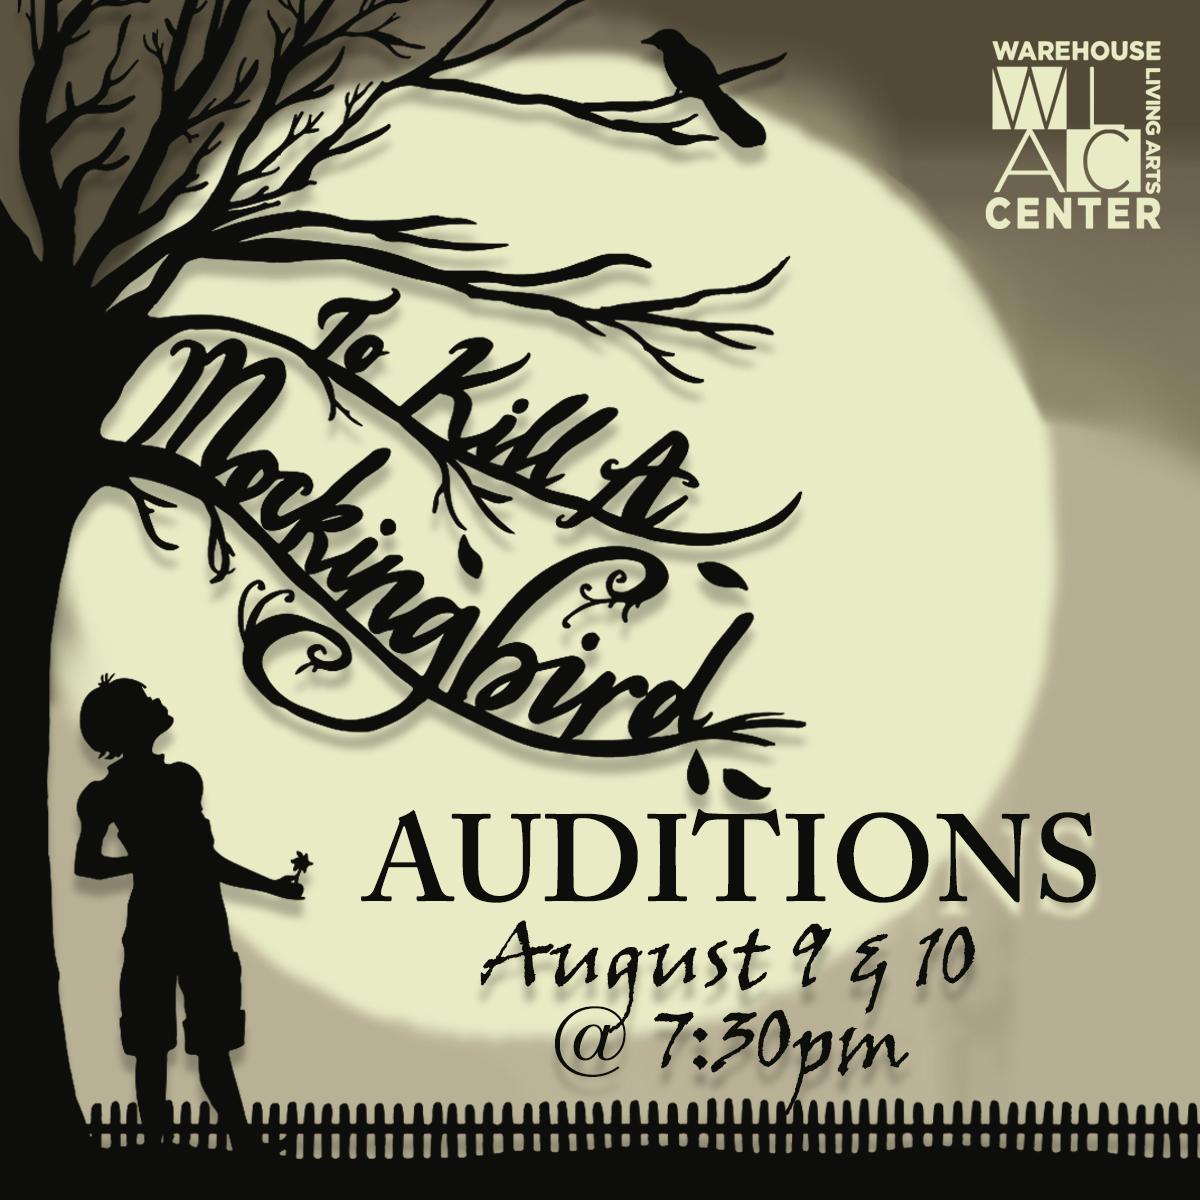 To Kill a Mockingbird Auditions at WLAC